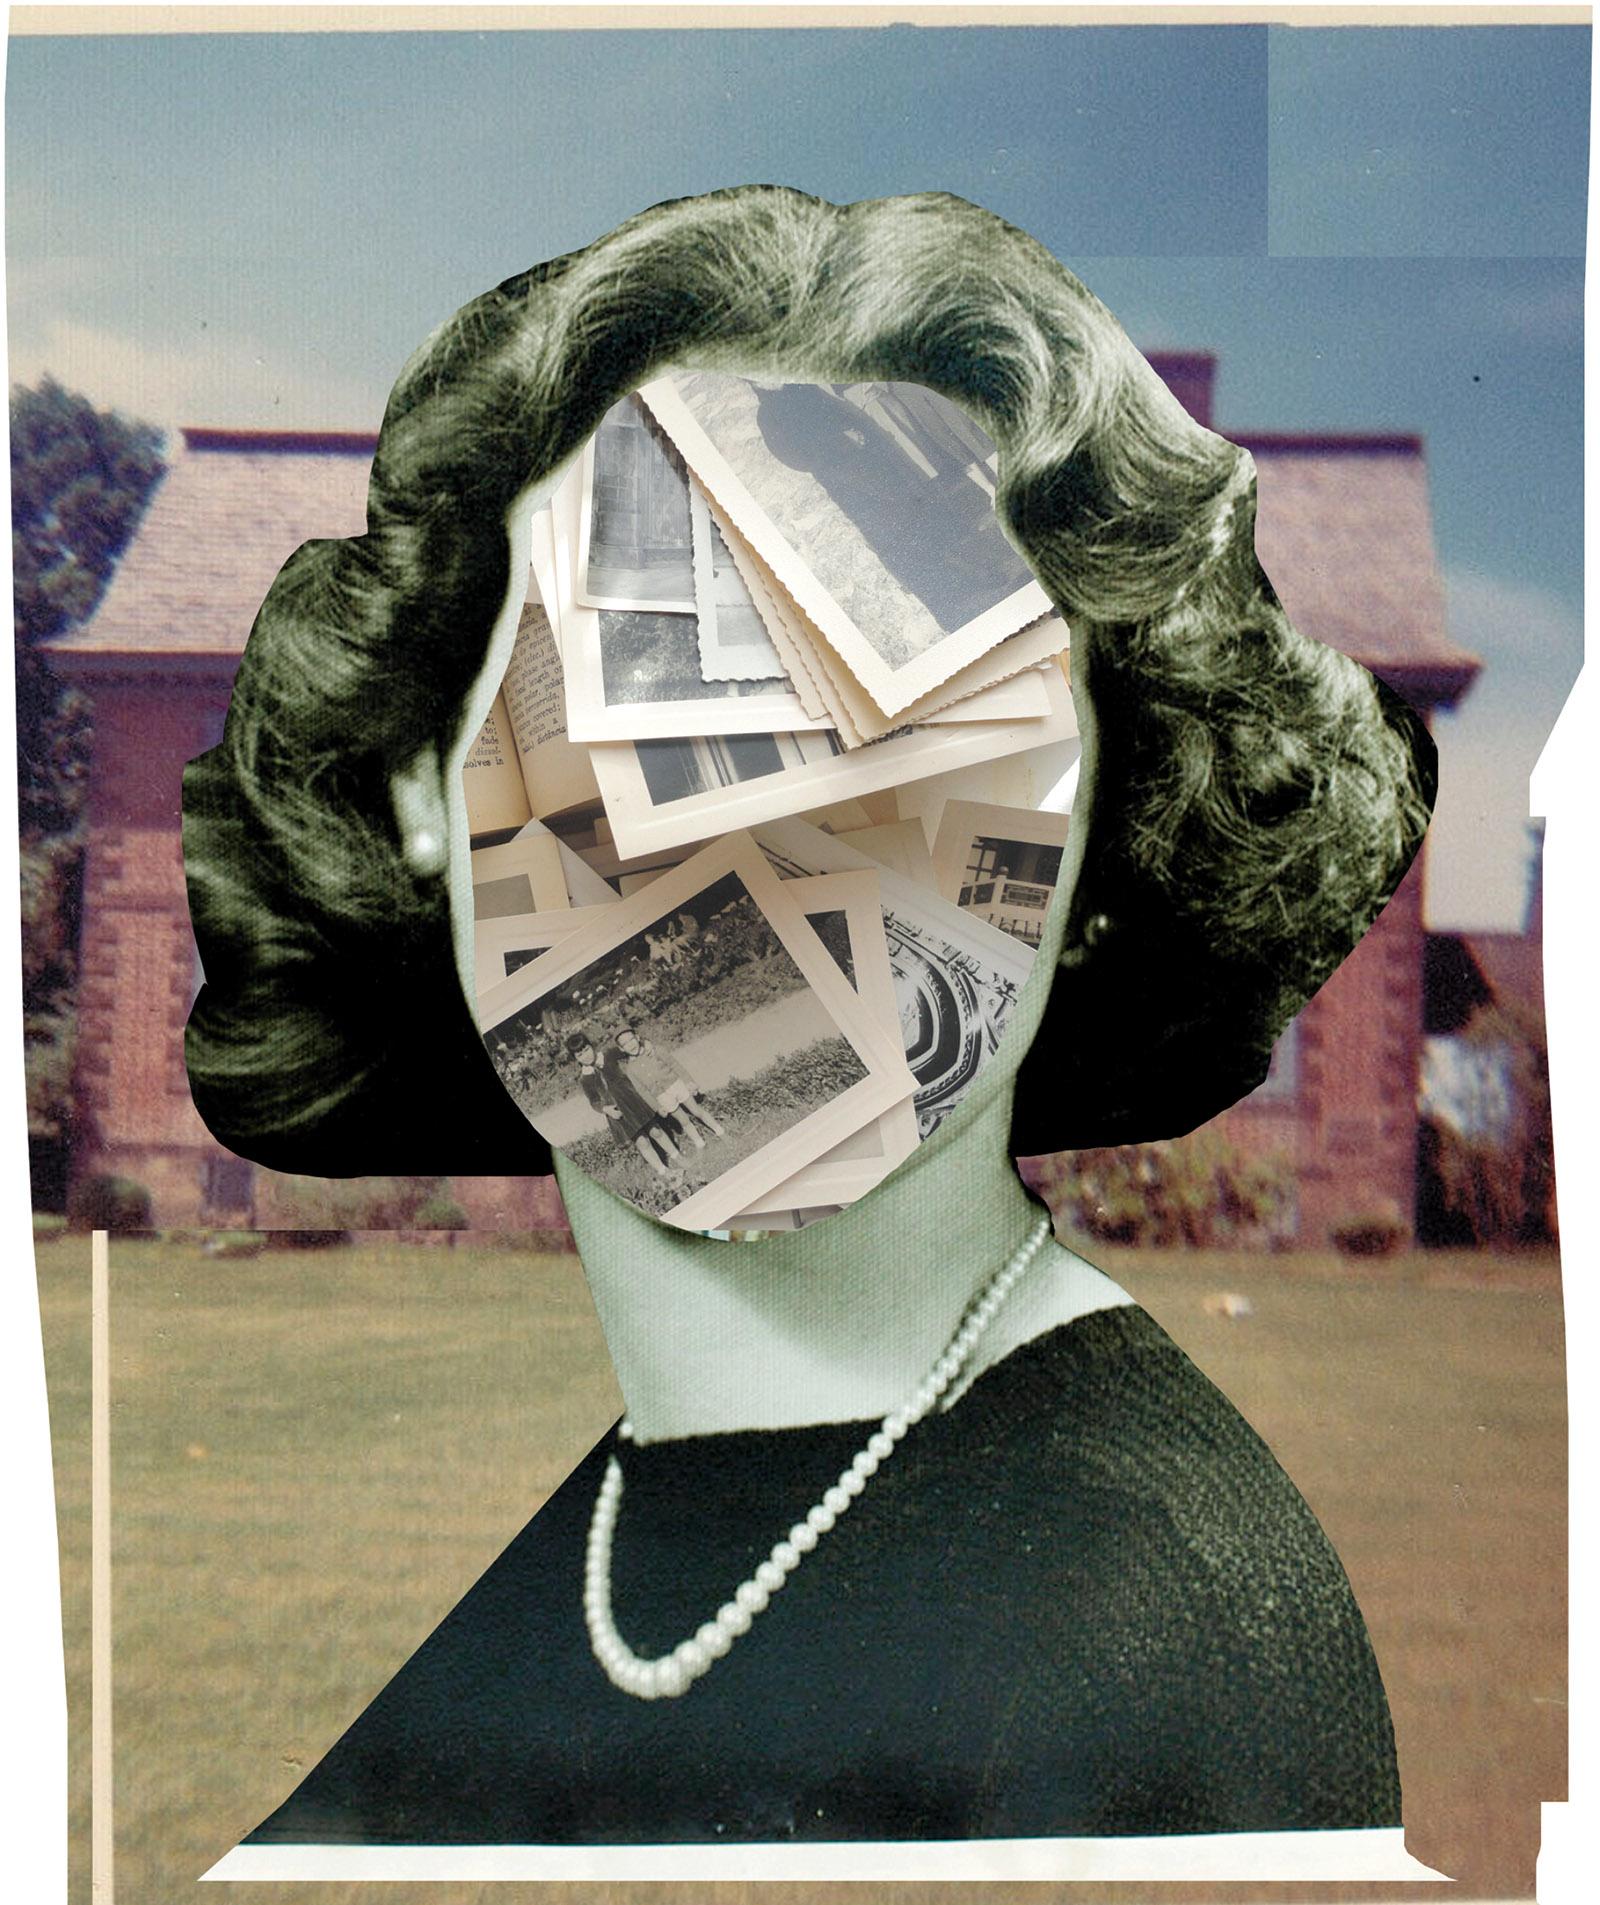 'Fading Memory,' 2014; collage by Johanna Goodman